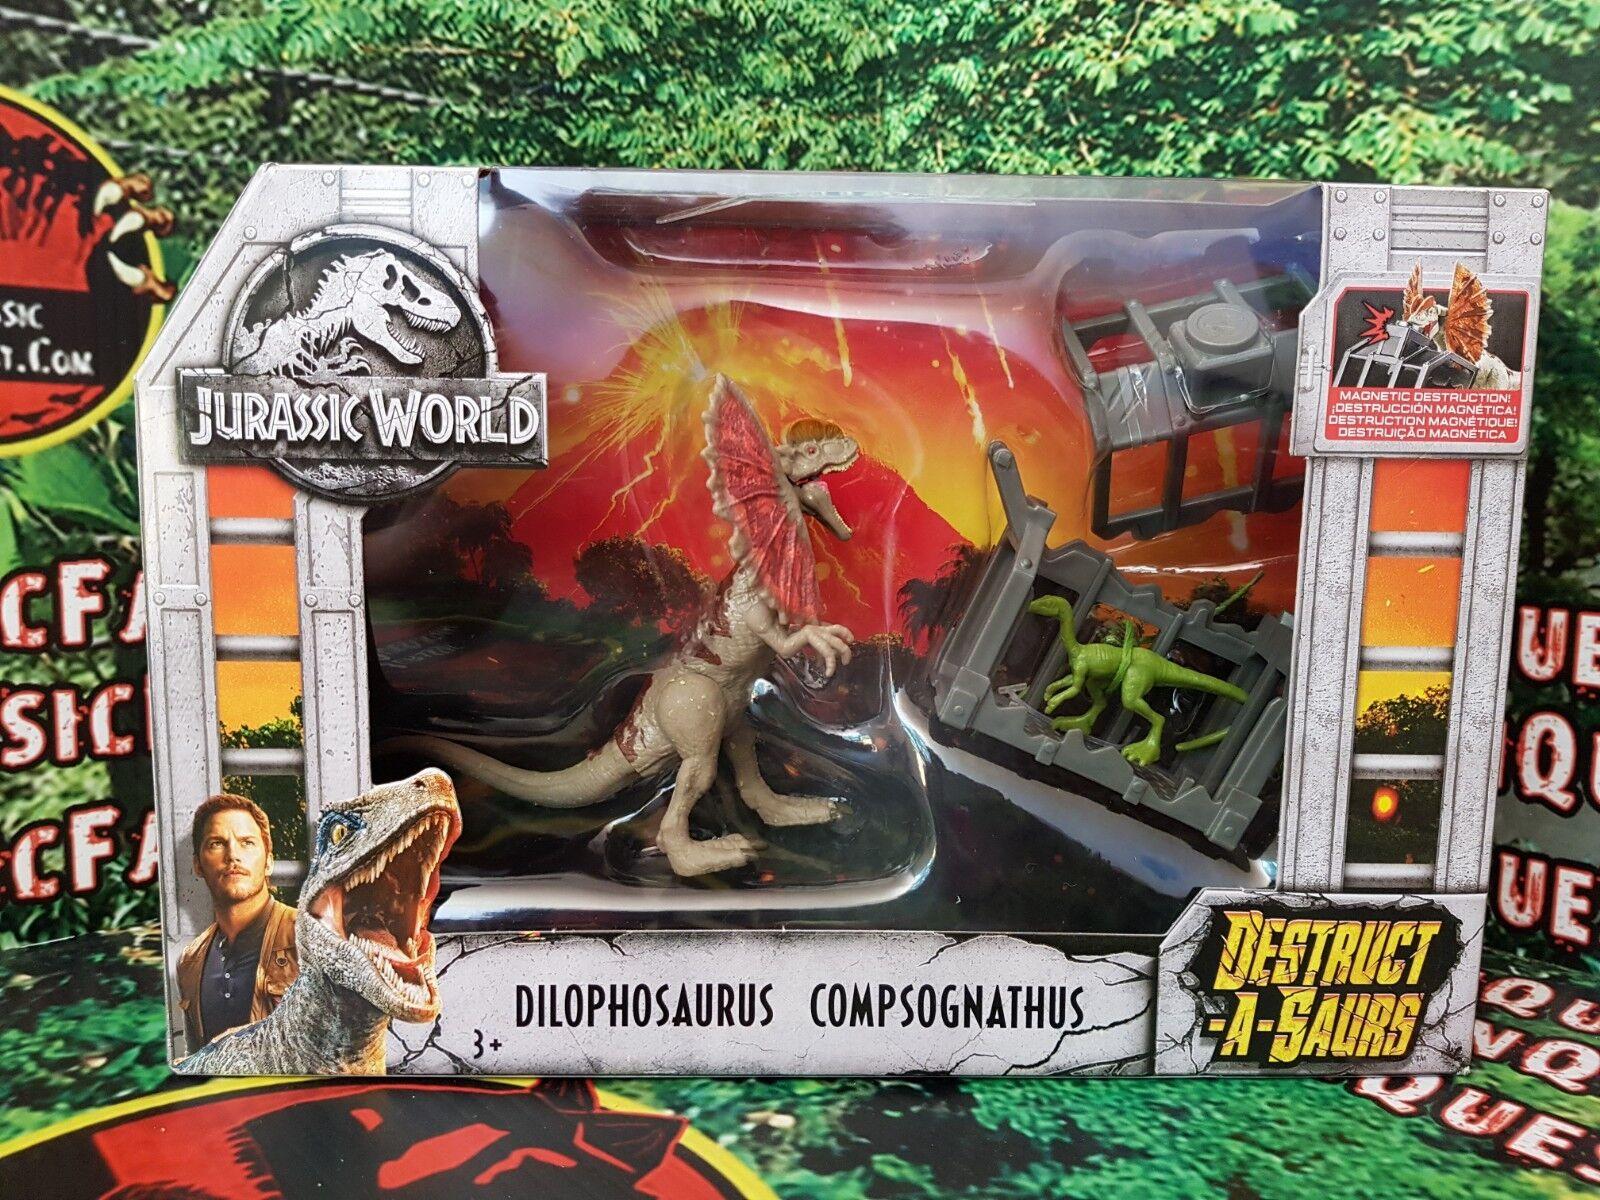 Jurassic World Fallen Kingdom Destruct-a-saurs Dilophosaurus & Compsognathus New